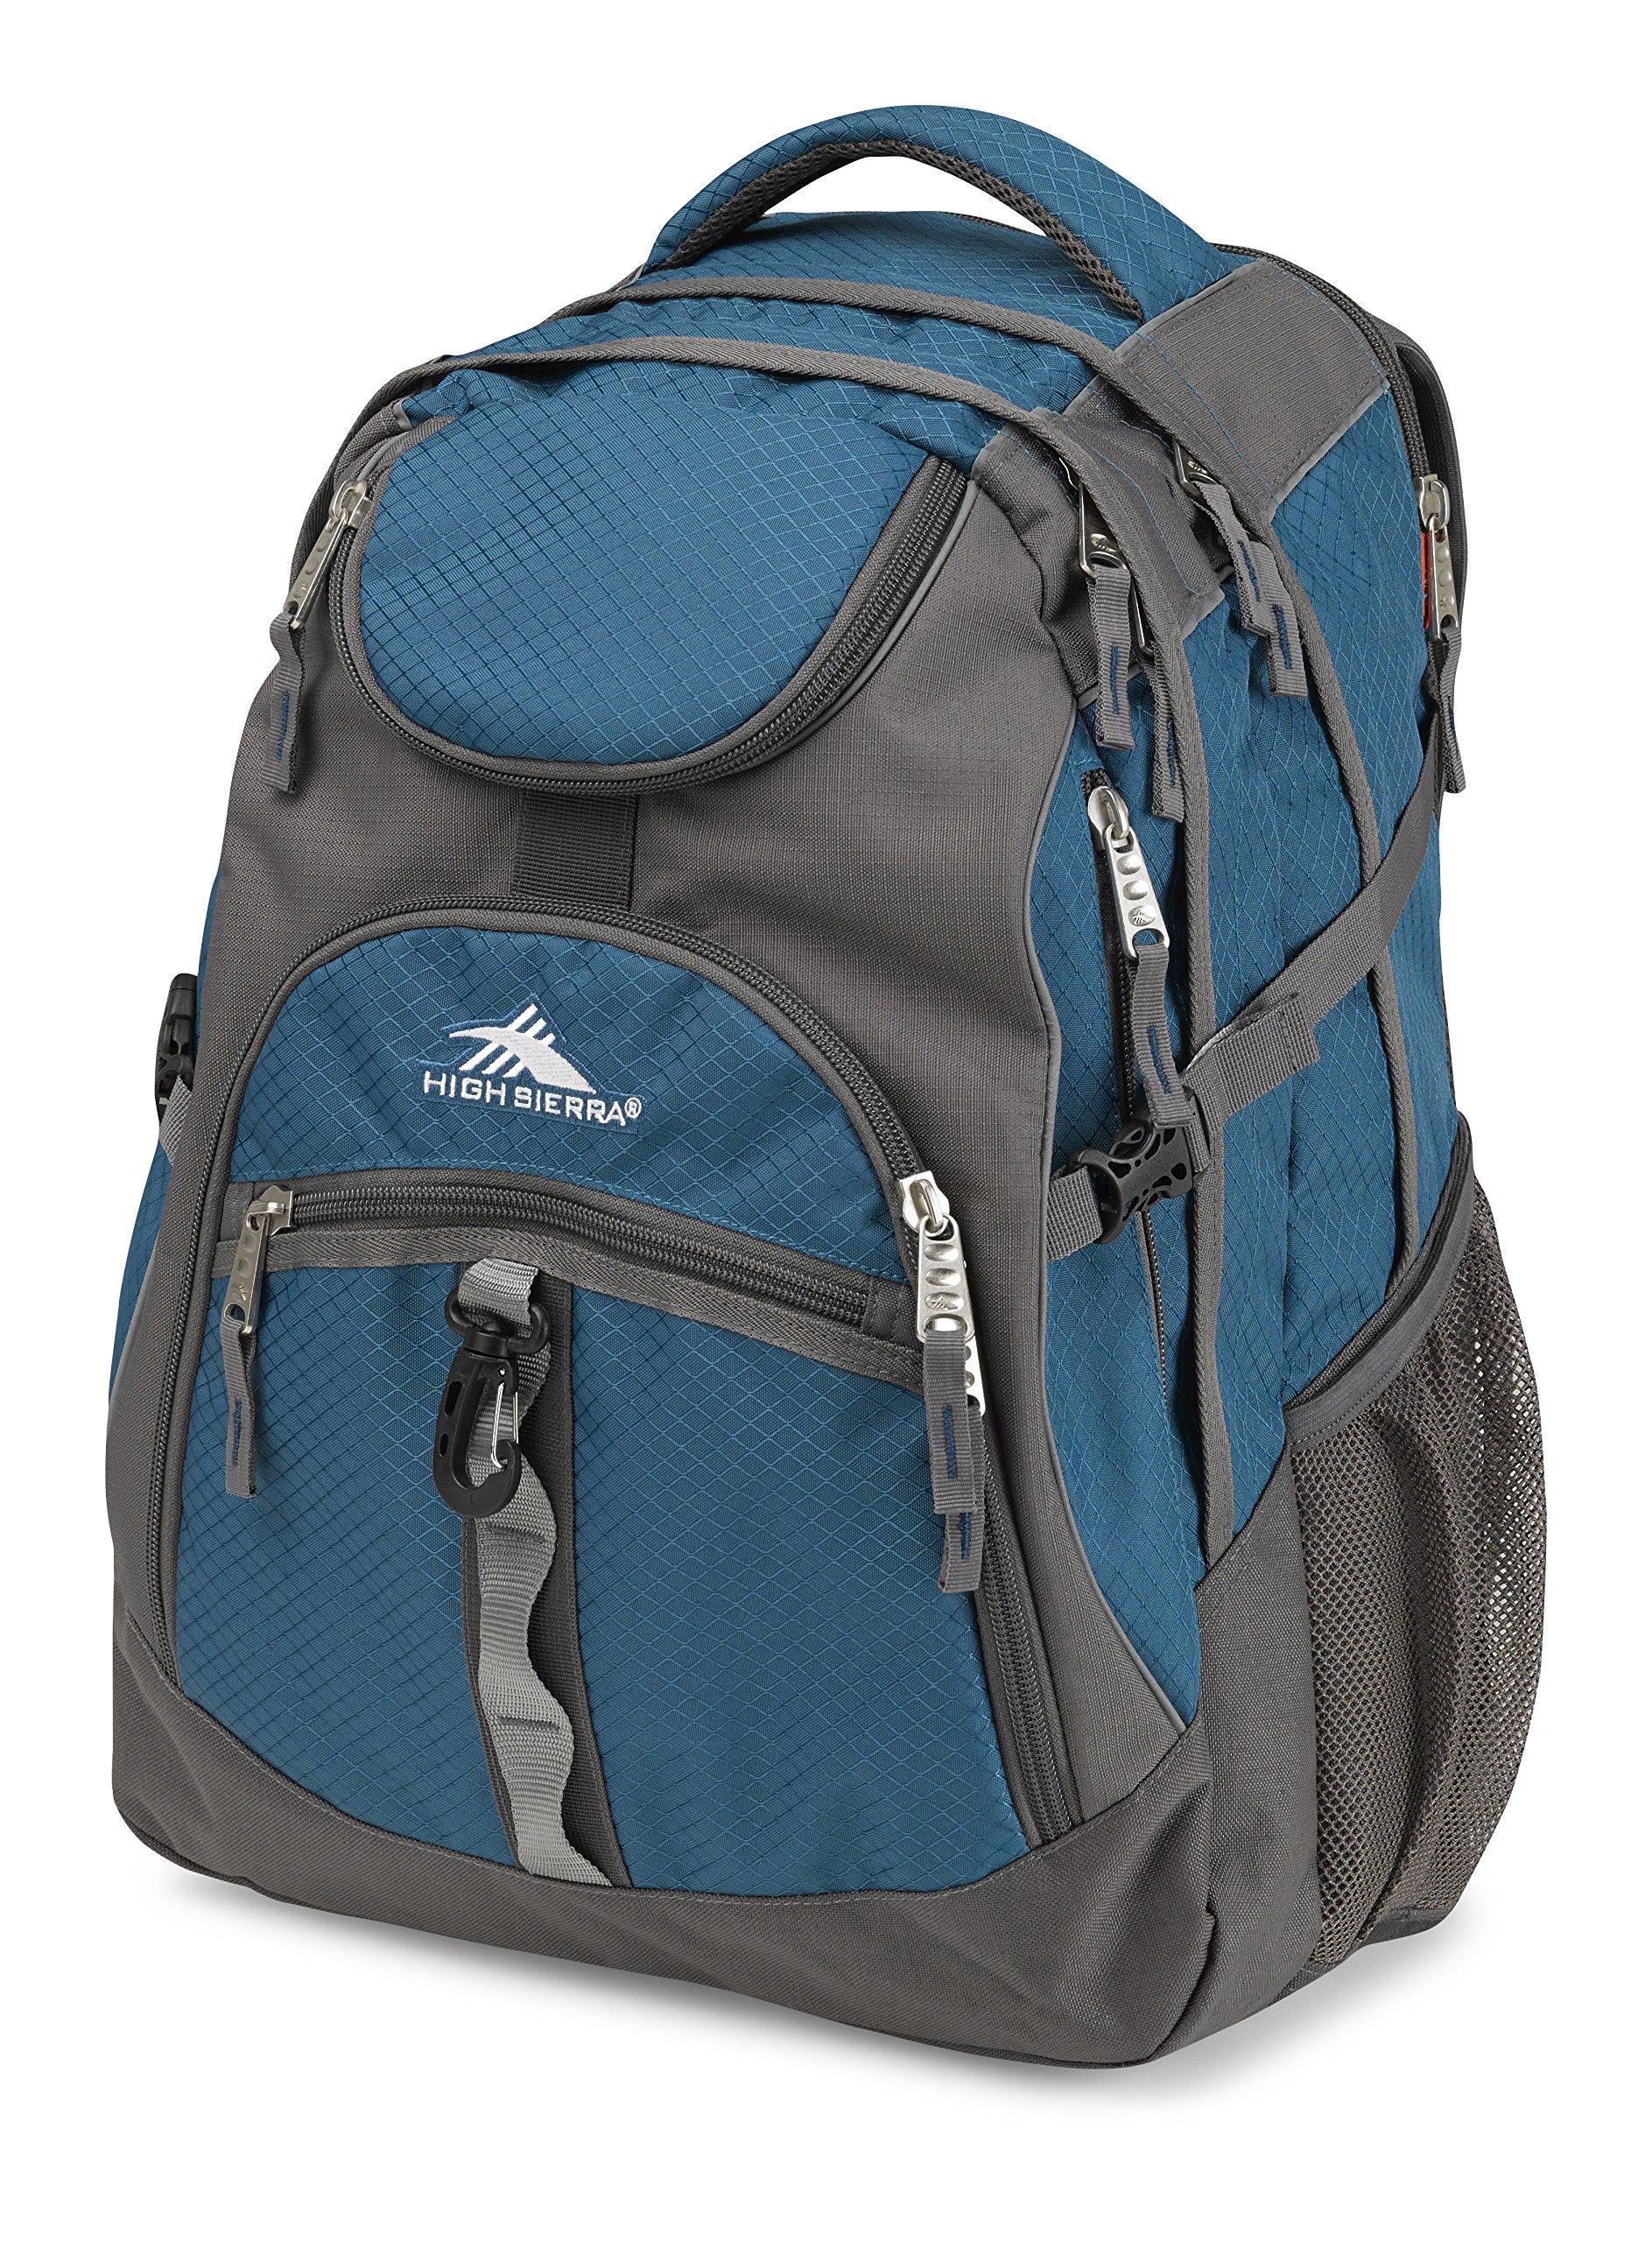 High Sierra Access Laptop Backpack